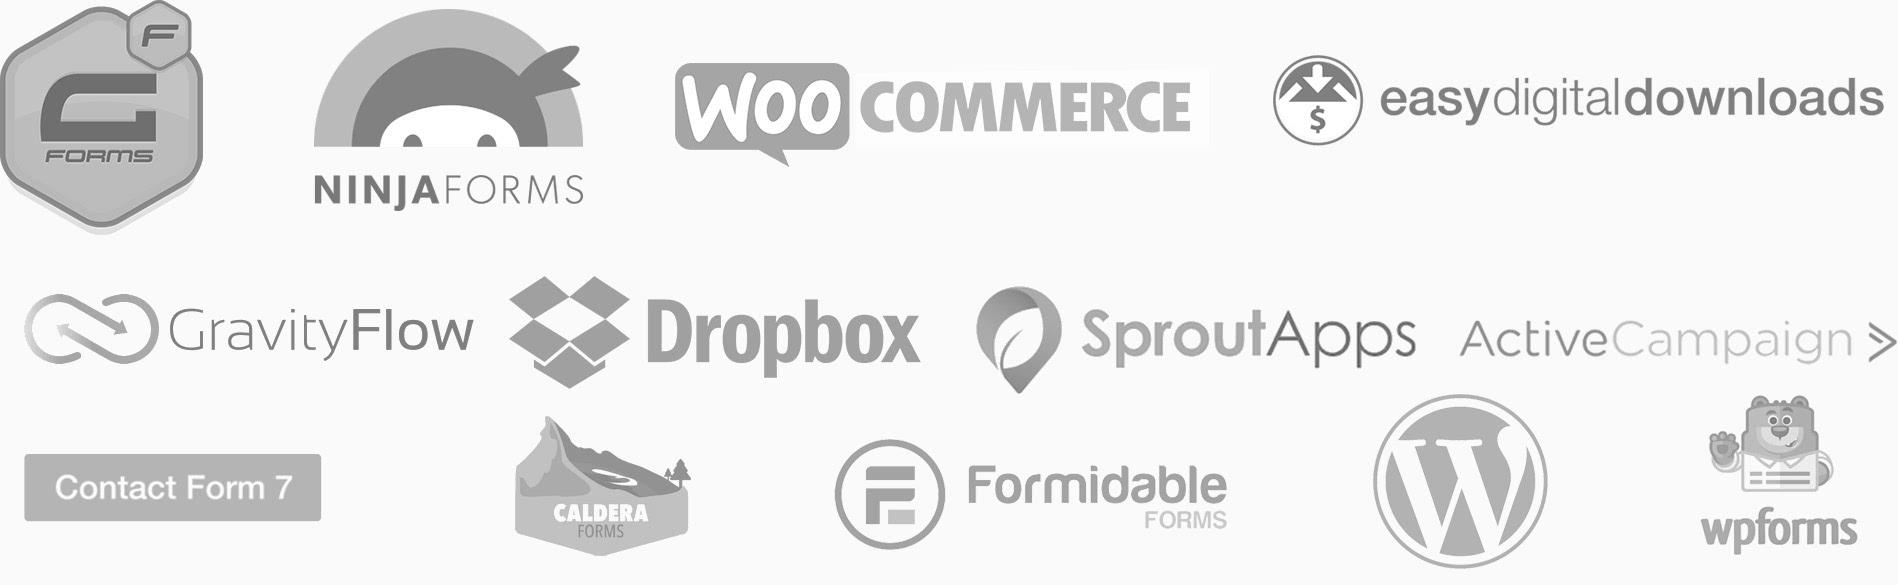 WordPress Esign Integrations